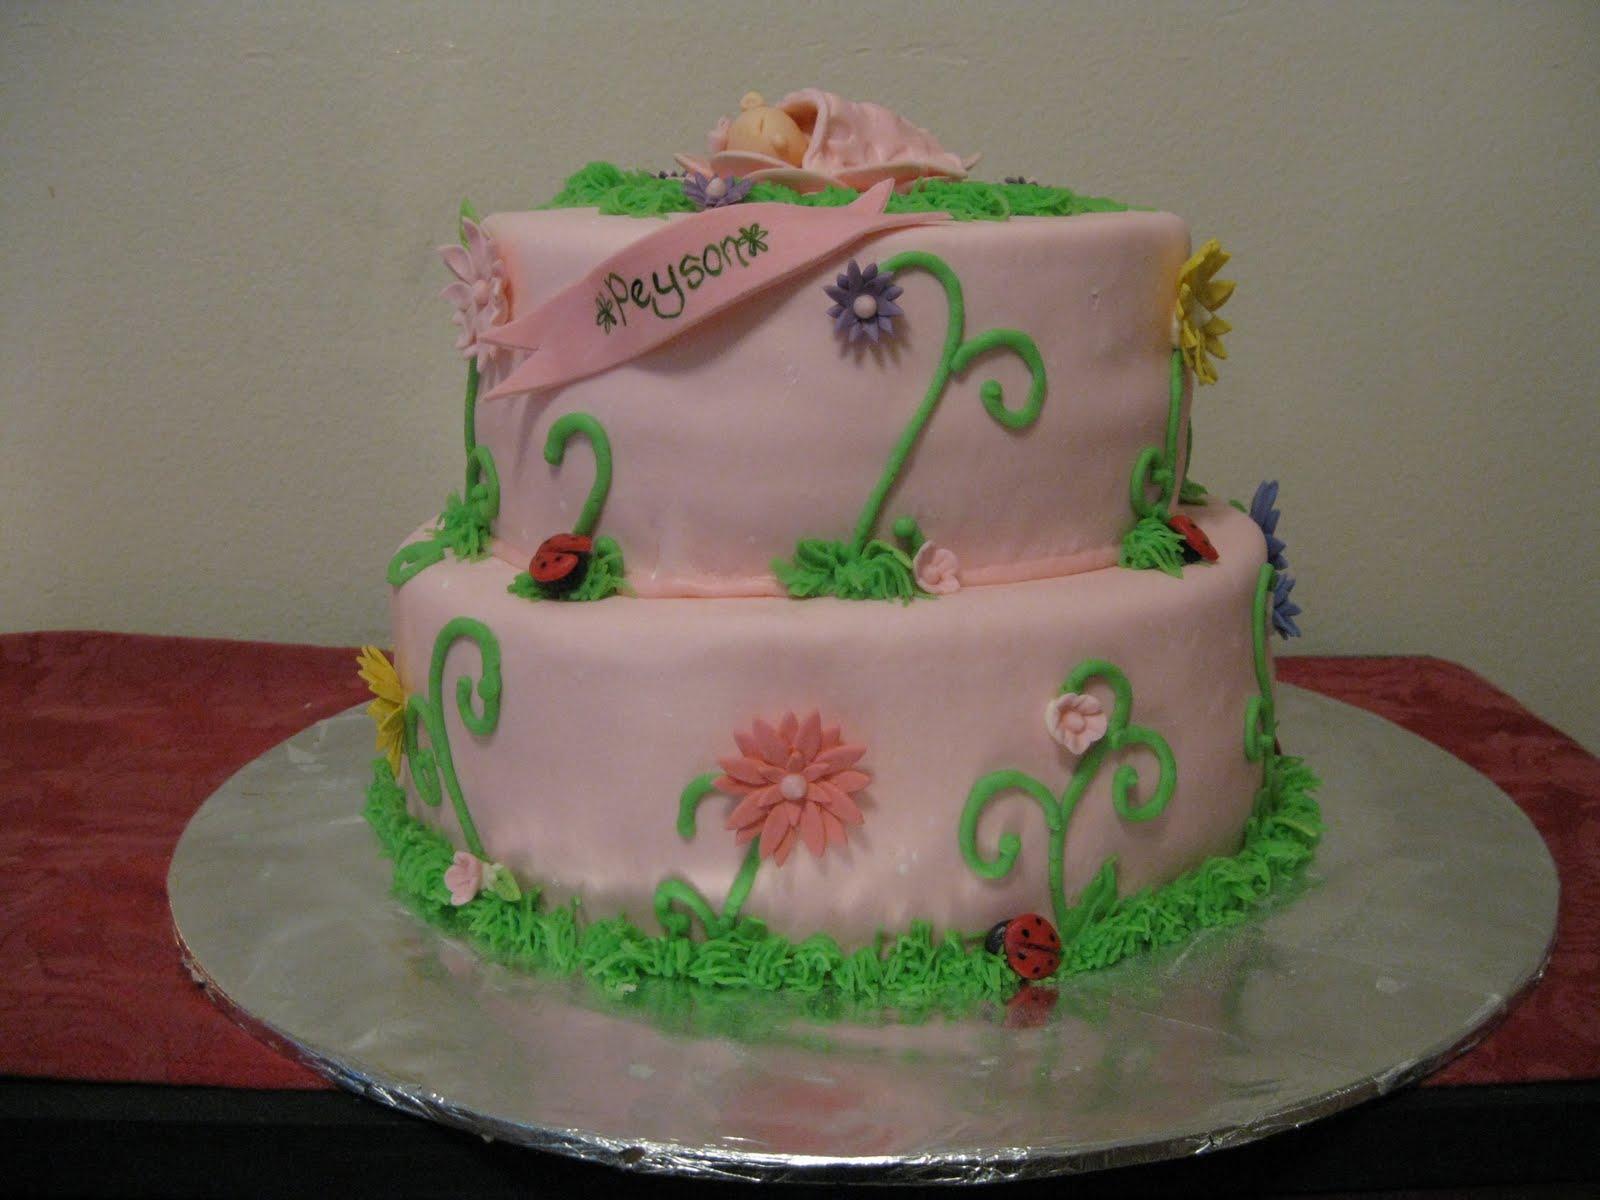 http://2.bp.blogspot.com/_6CipURq-OWg/TDeFgm9aNZI/AAAAAAAAAiU/x1t6F2-Md80/s1600/cake+and+field+day+001.JPG